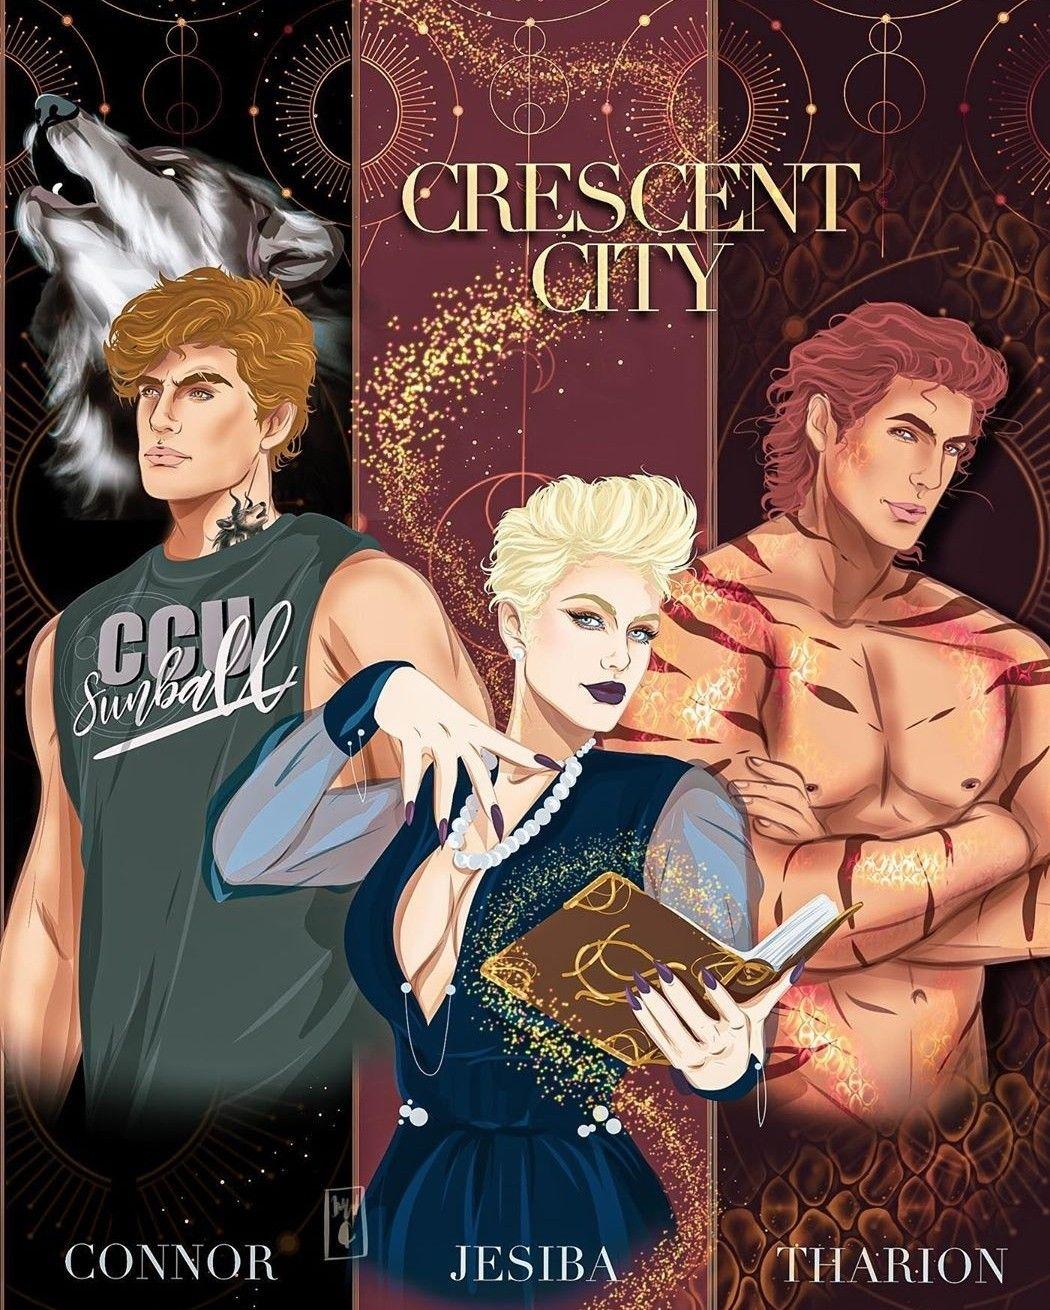 Crescent City #JemlinCreations